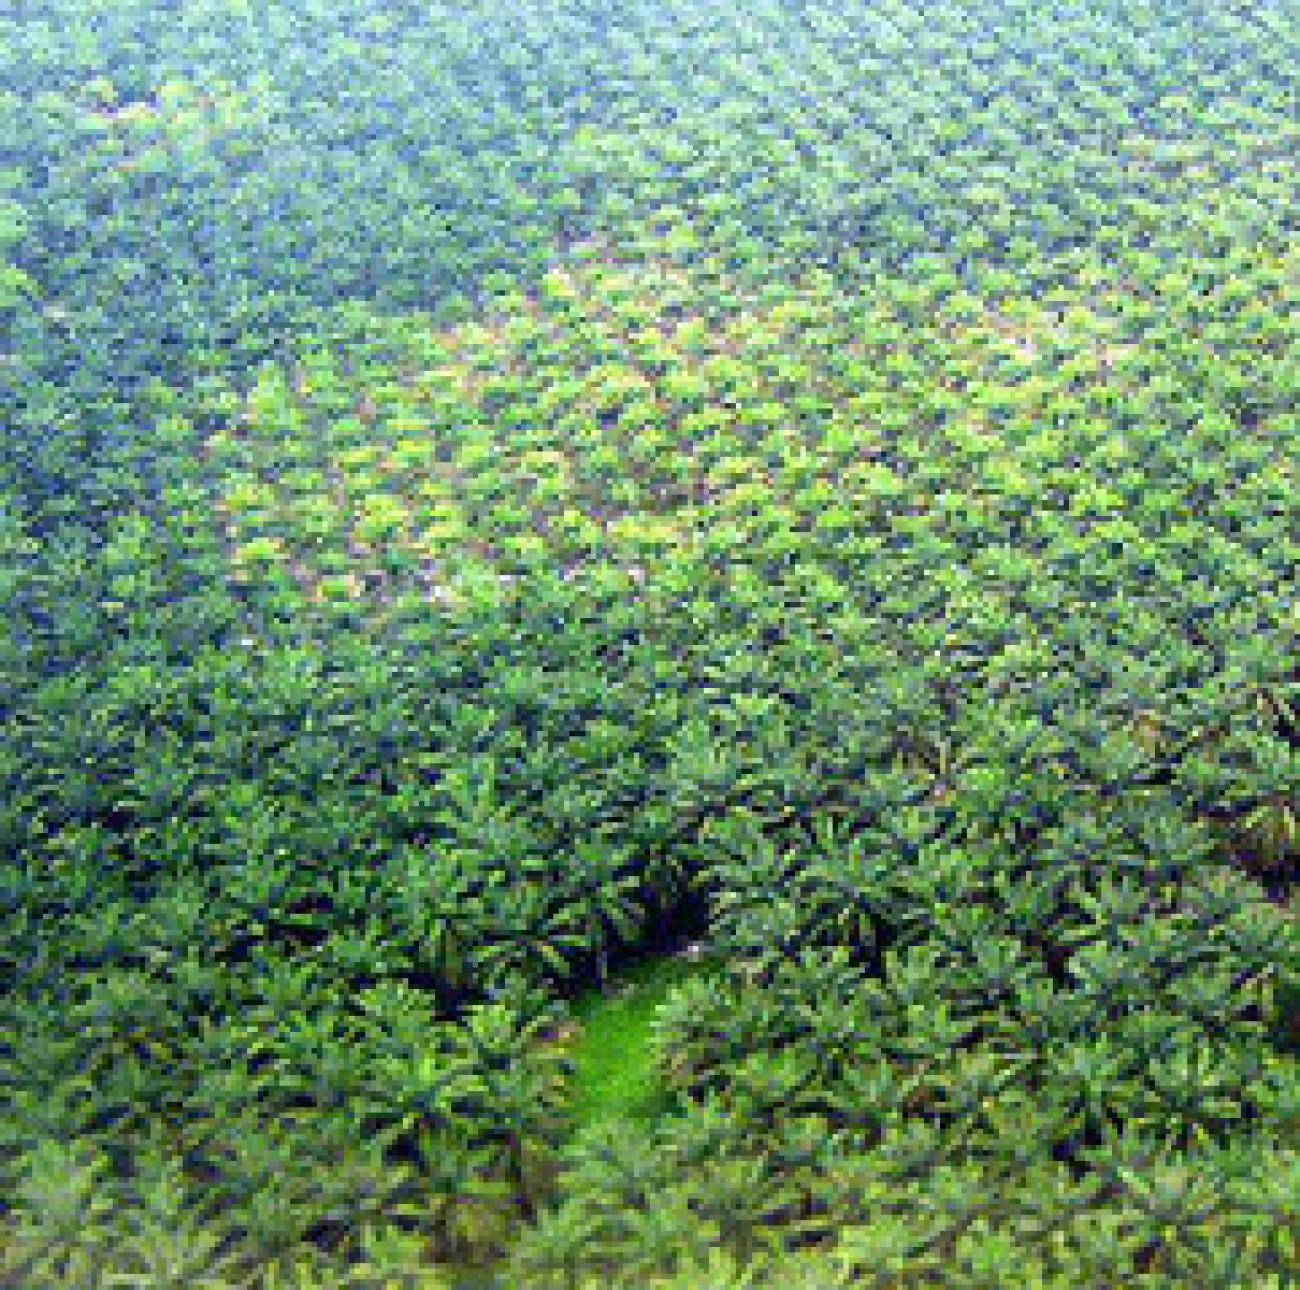 Cegah Asing Dominasi Lahan Sawit, Izin HGU Dibatasi 100.000 Hektar